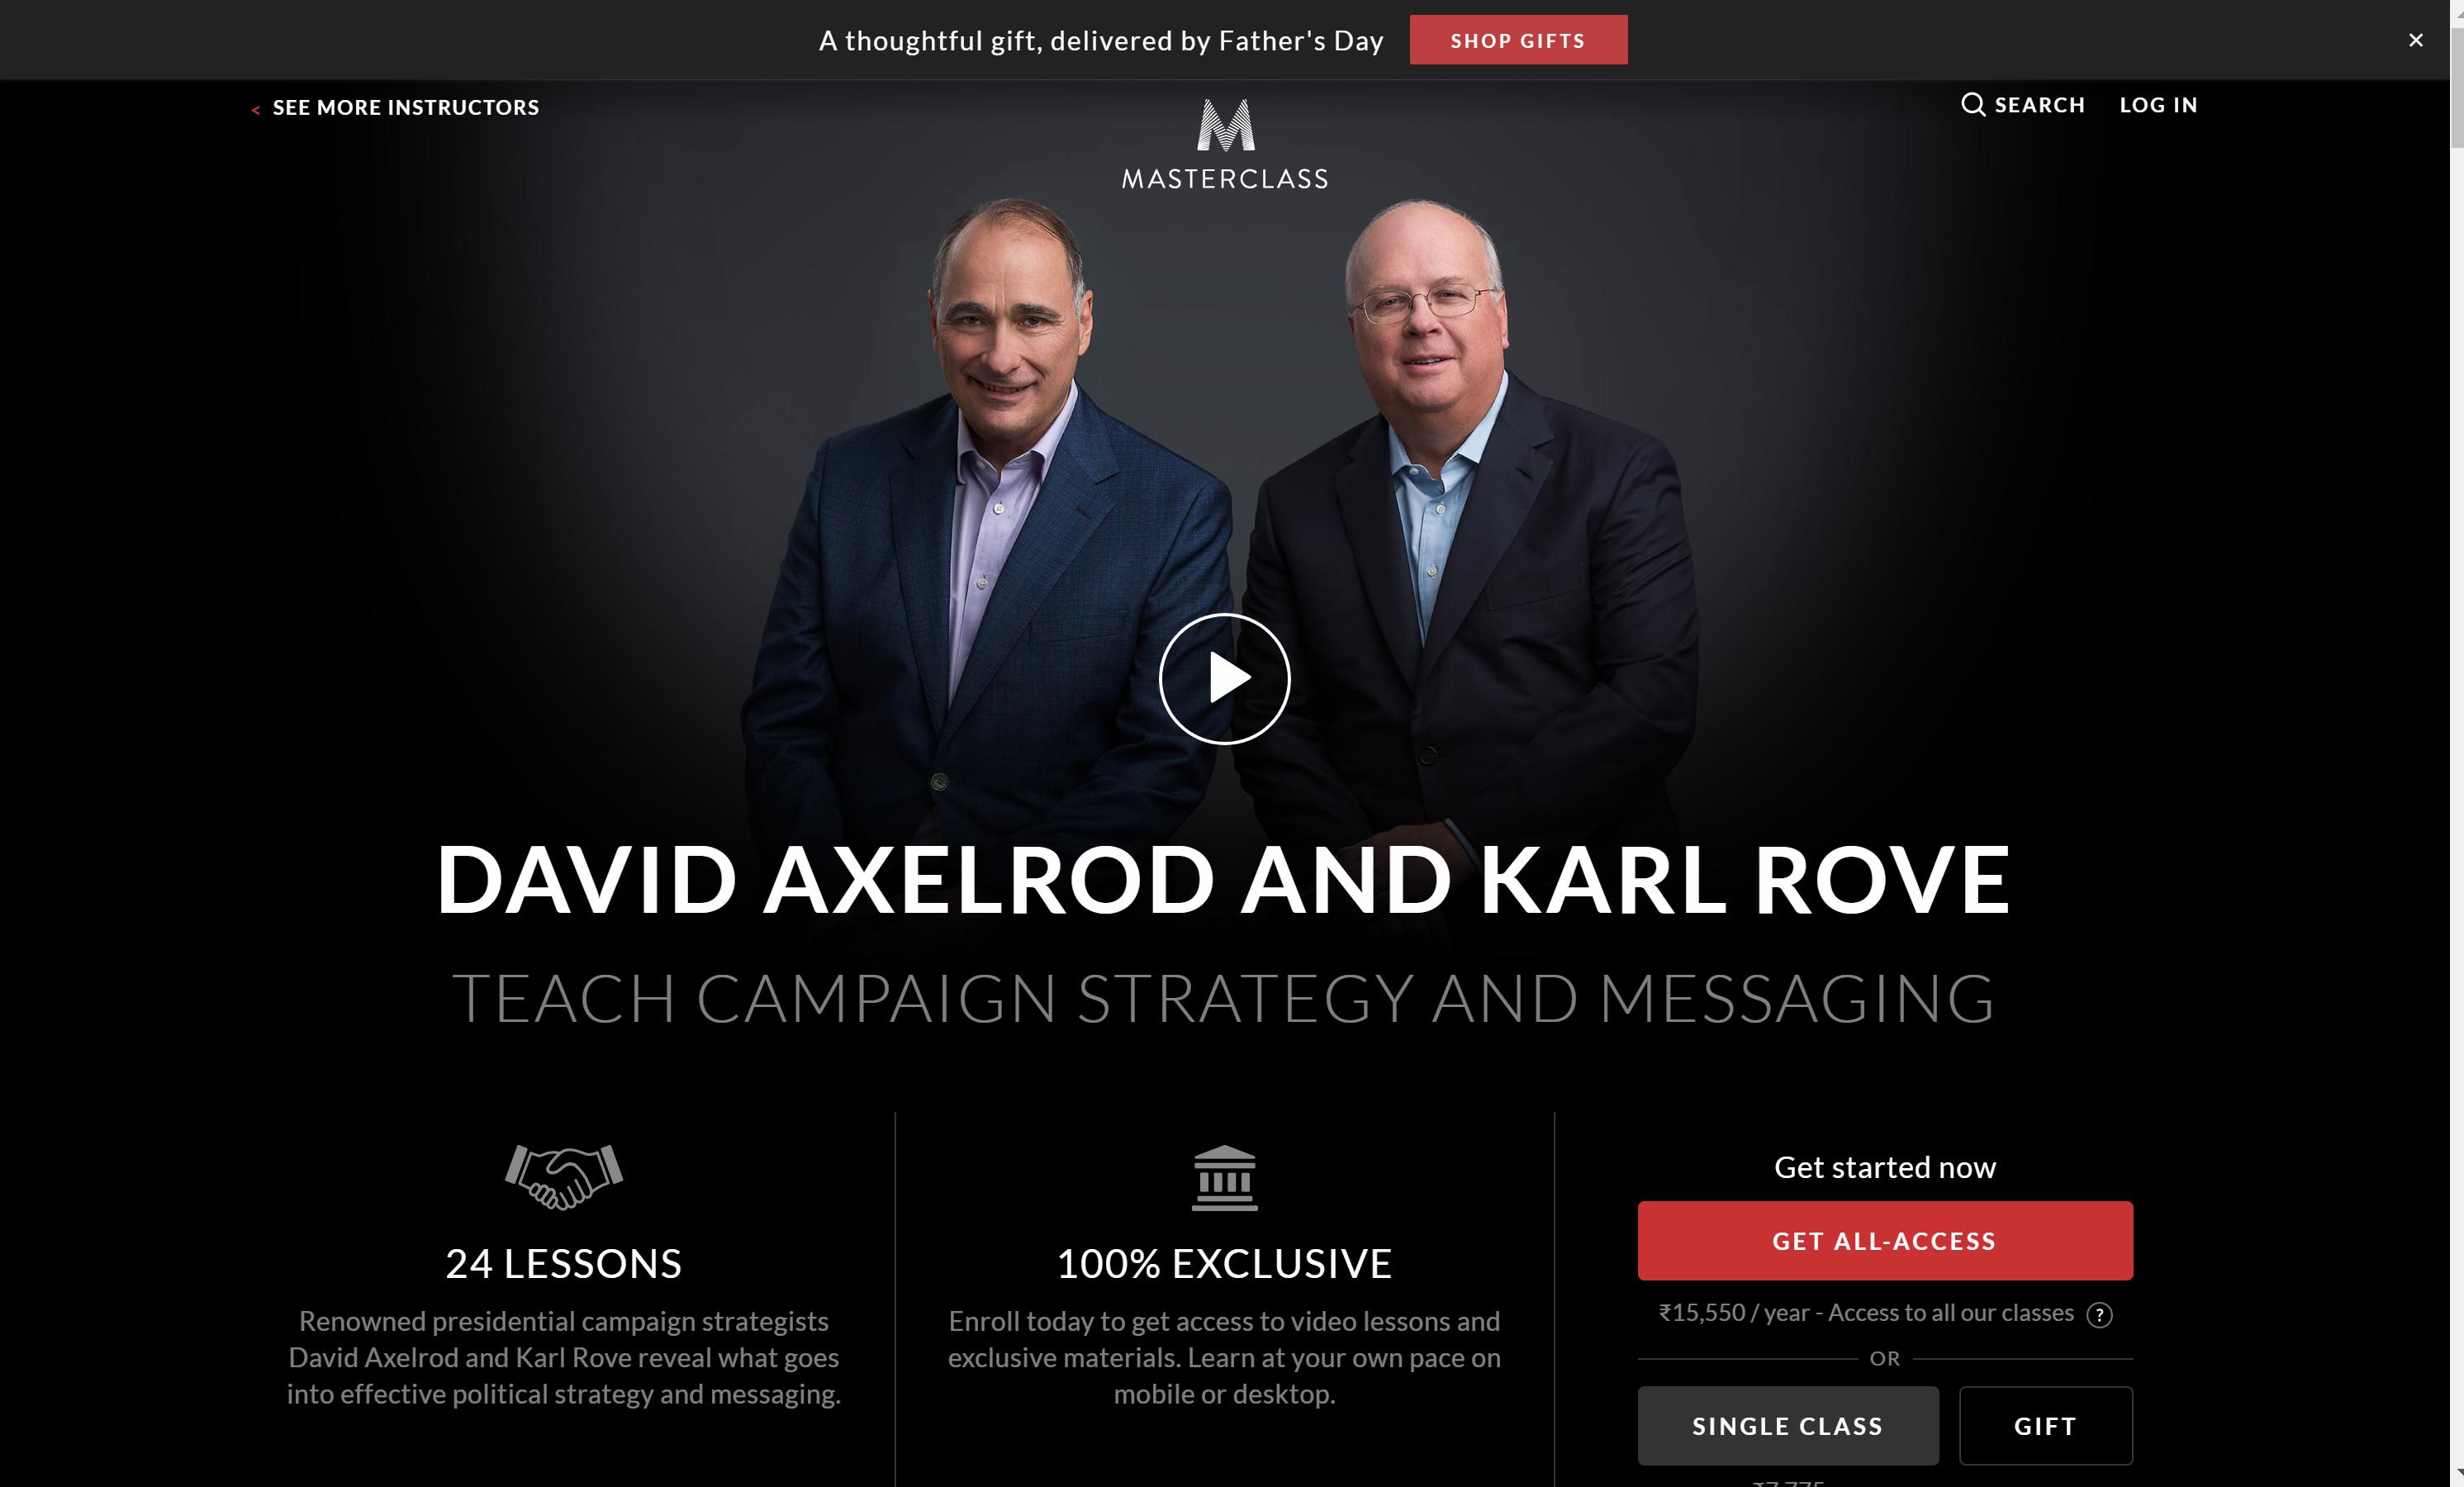 David Axelrod & Karl Rove Masterclass